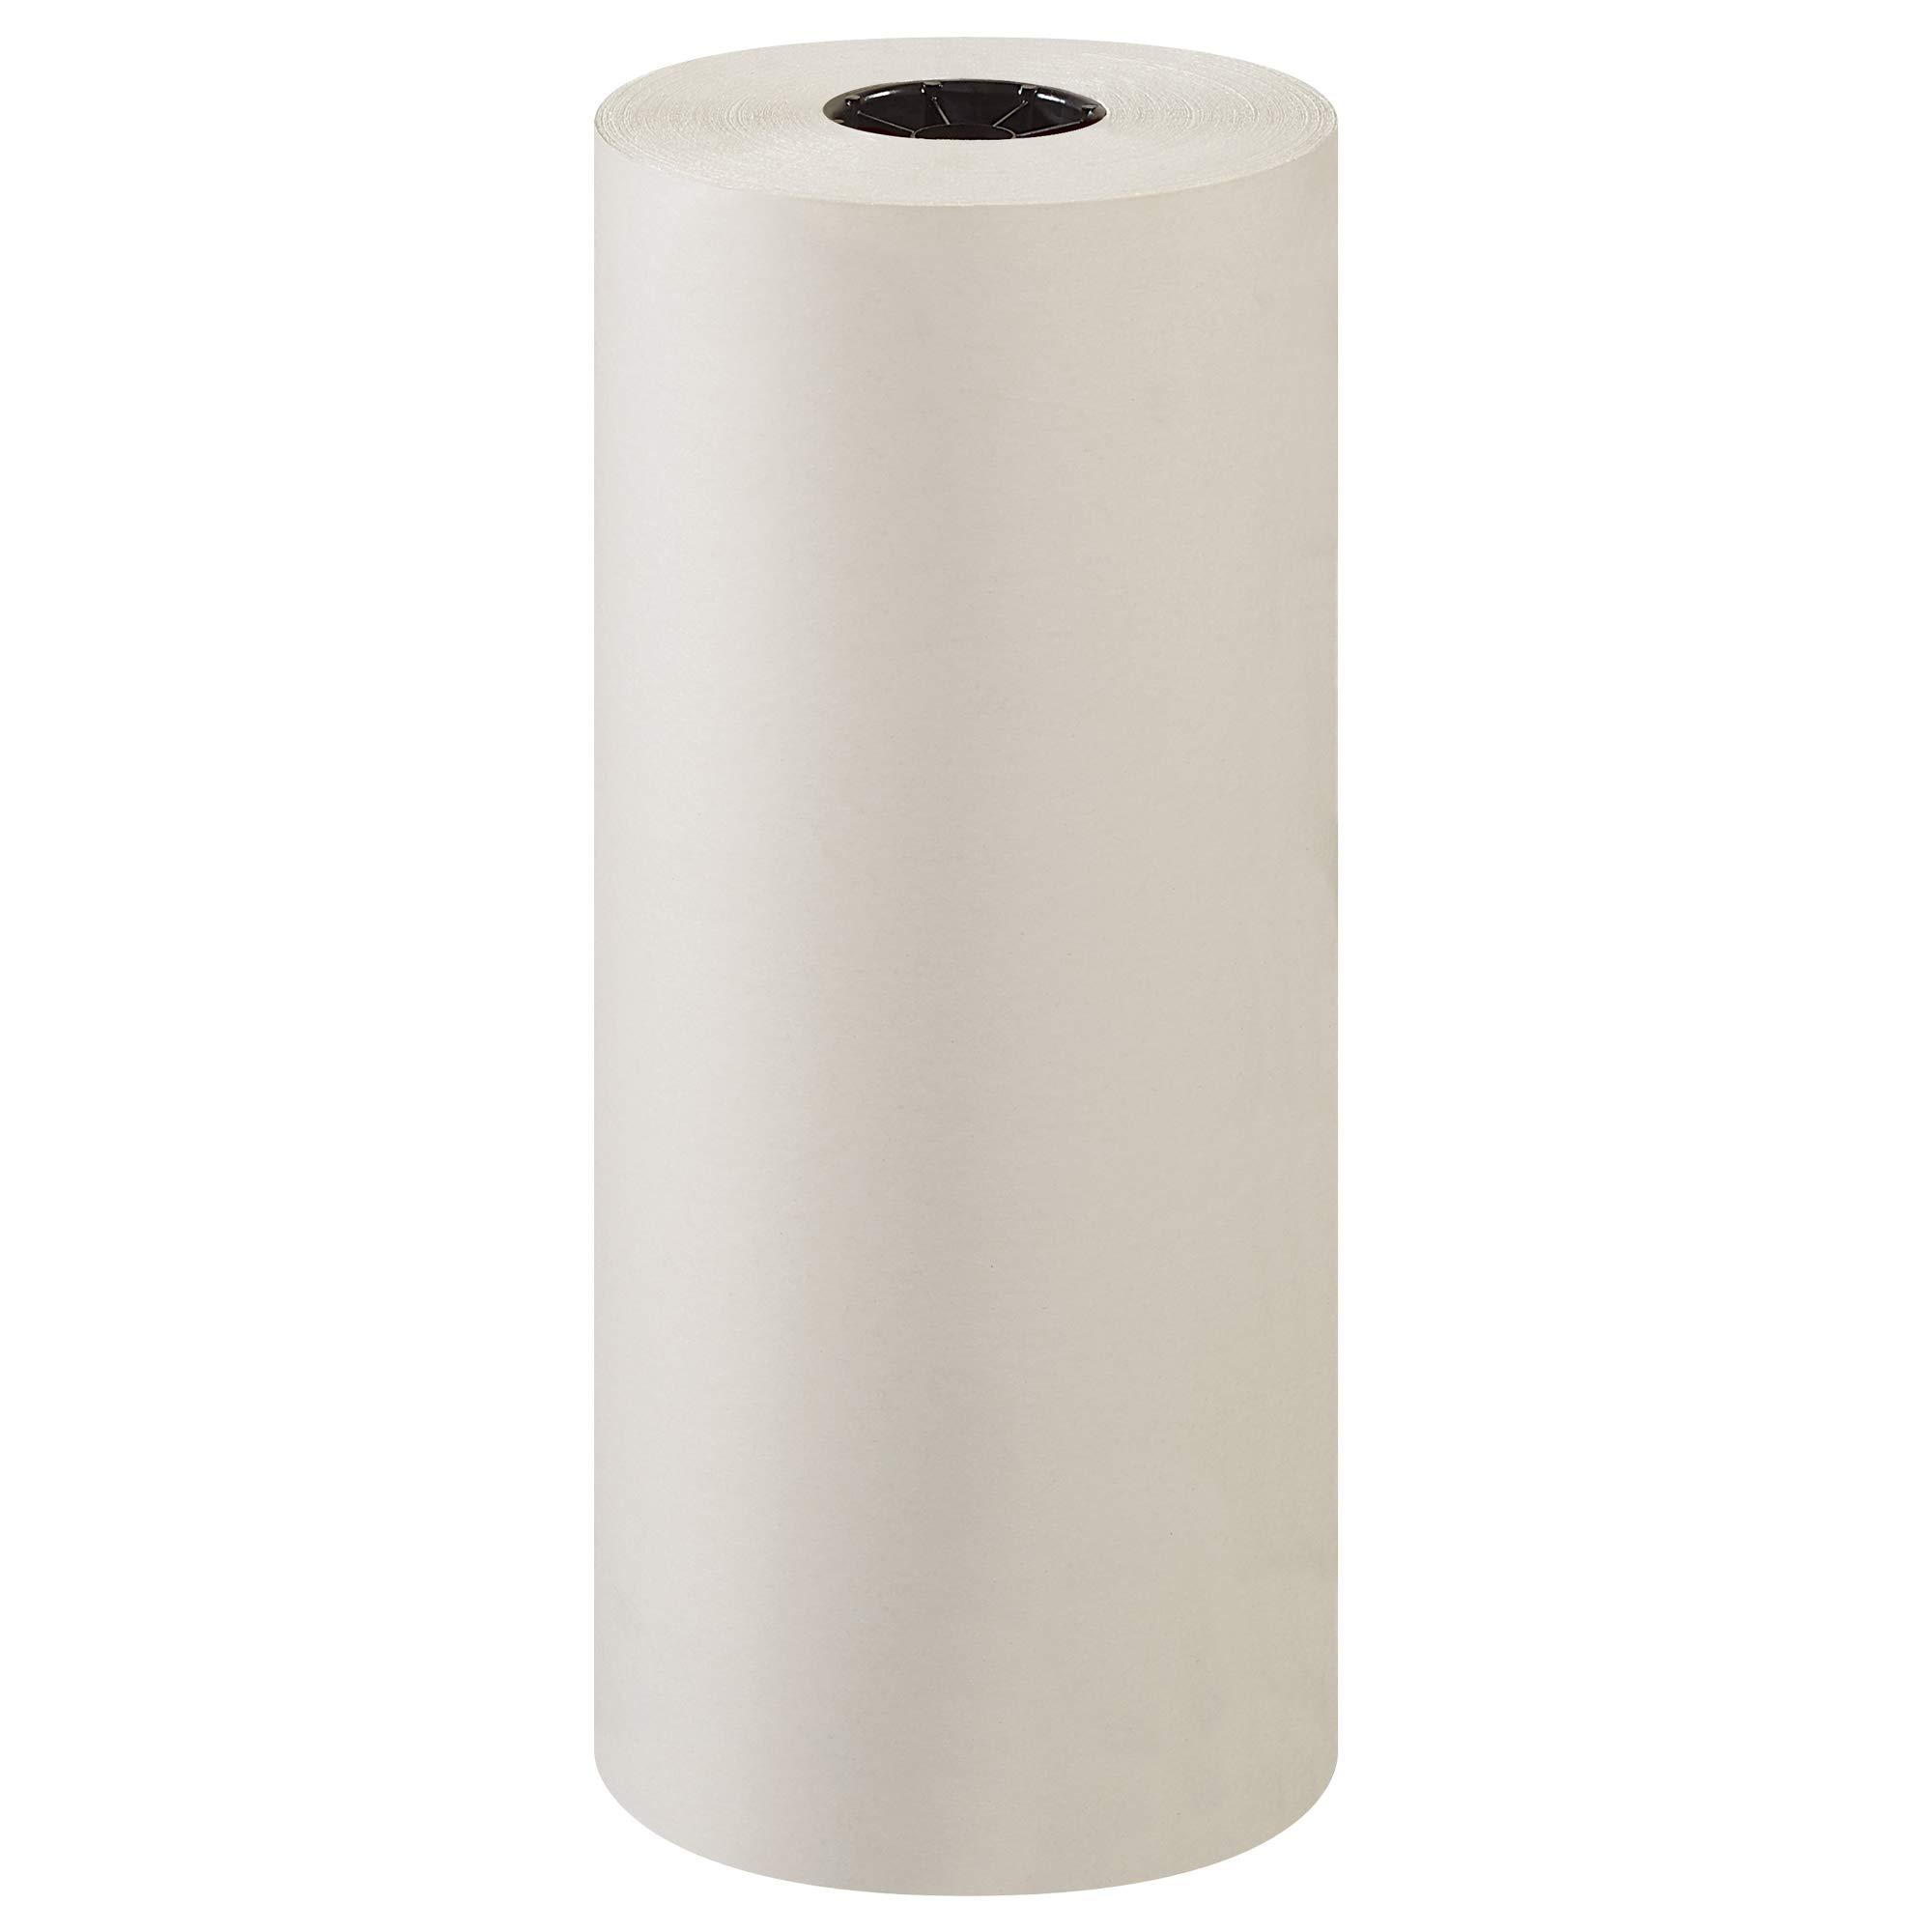 "Aviditi 100 Percent Recycled Paper Newsprint Roll, 1440' X 20"", White (NP2090)"